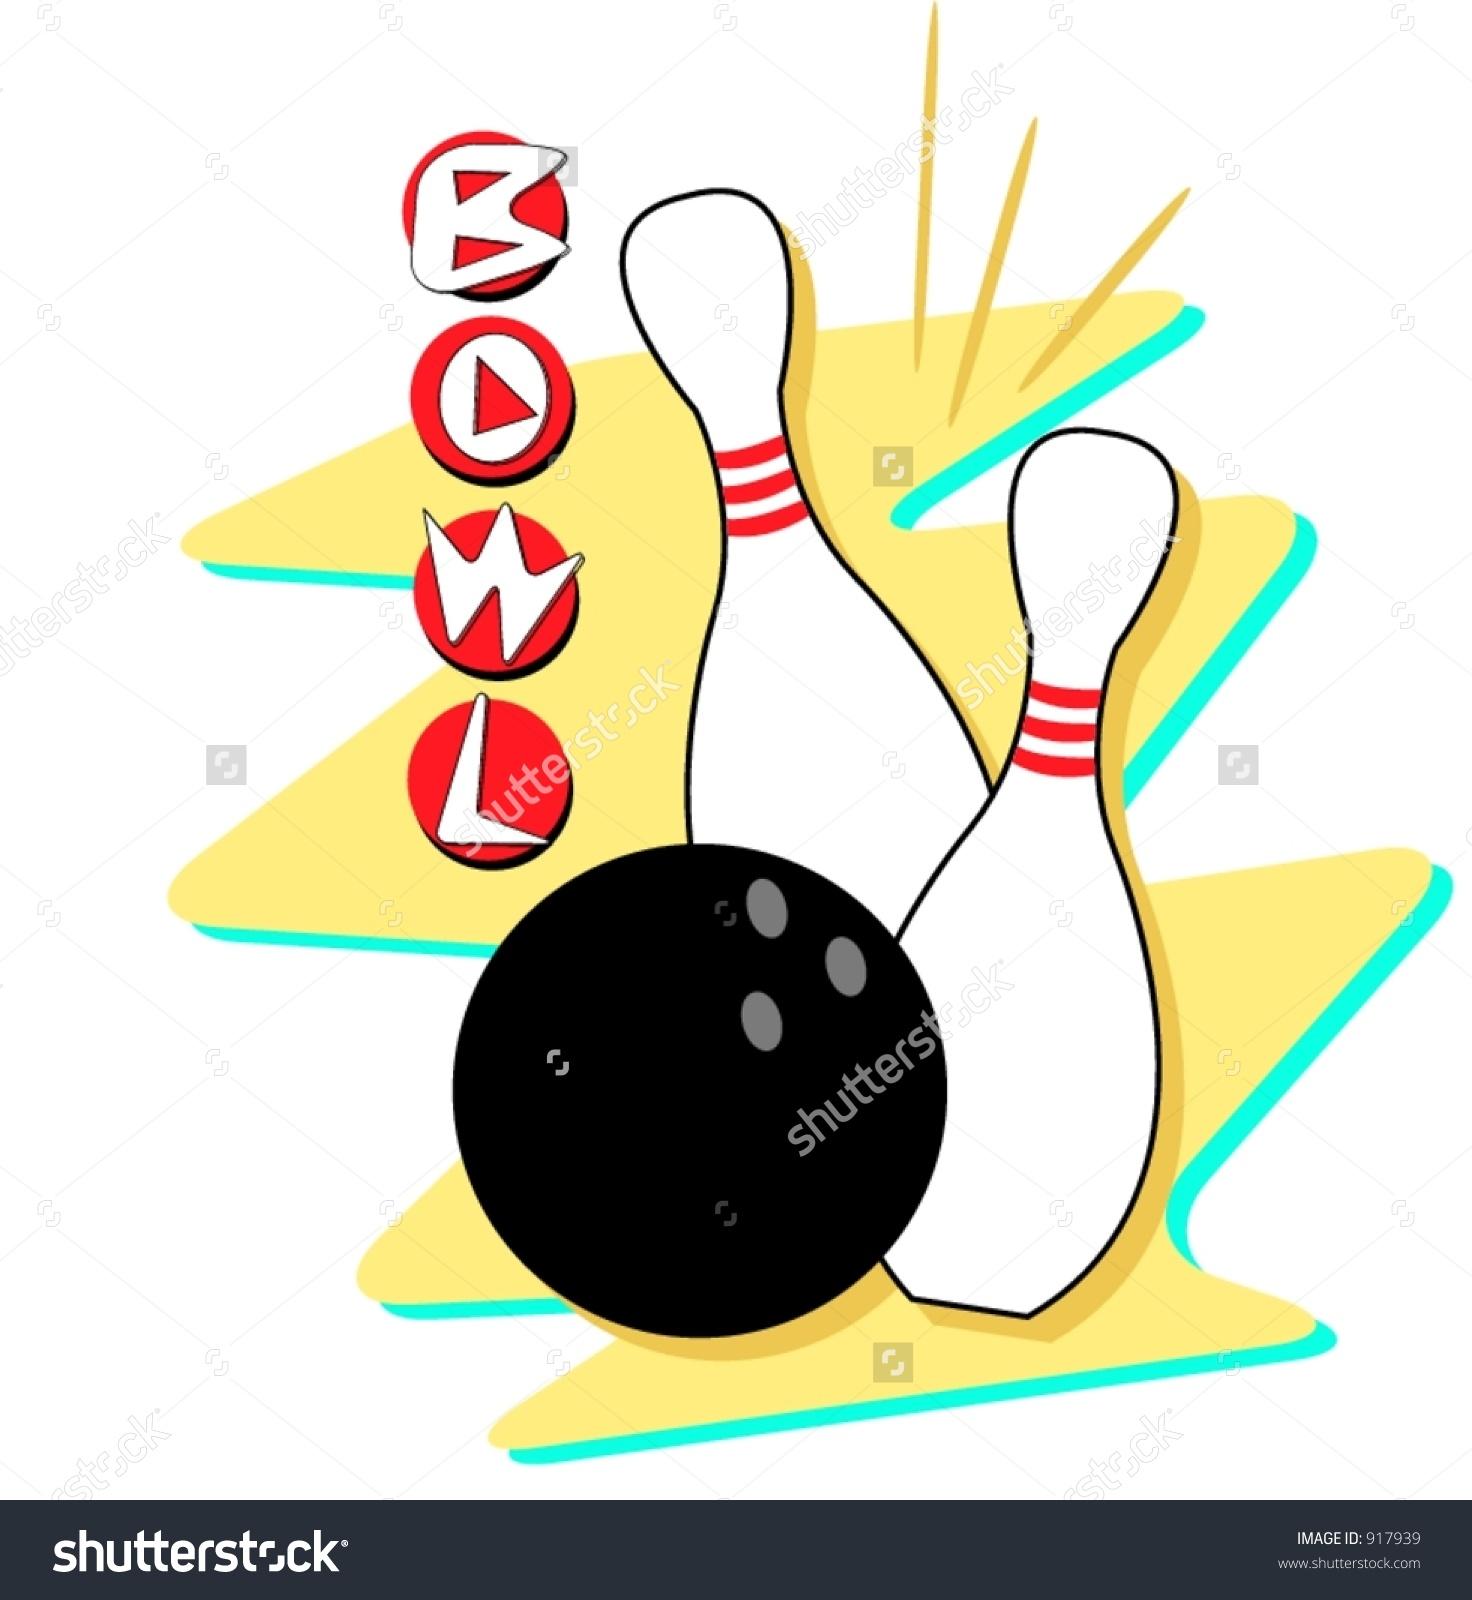 Retro Styled Bowling Clip Art. Fully Sca-Retro styled bowling clip art. Fully scalable and editable vector art.-19